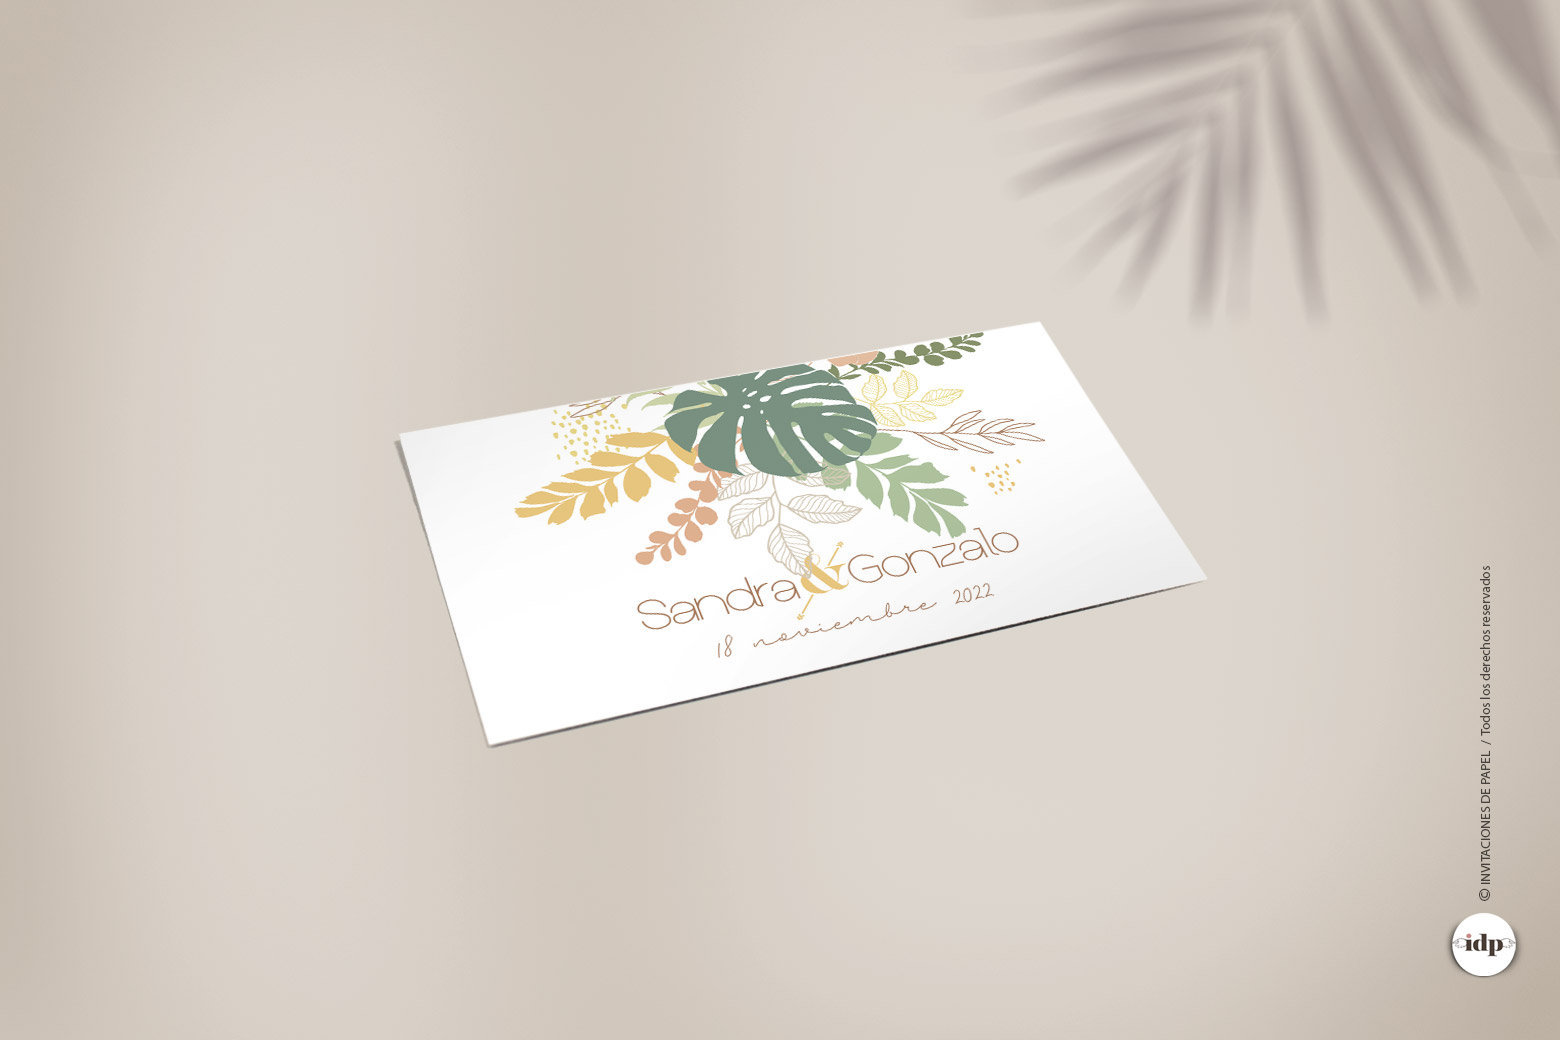 Etiqueta Adhesiva o Pegatina Tropical para Regalos de - rectangularamazonas